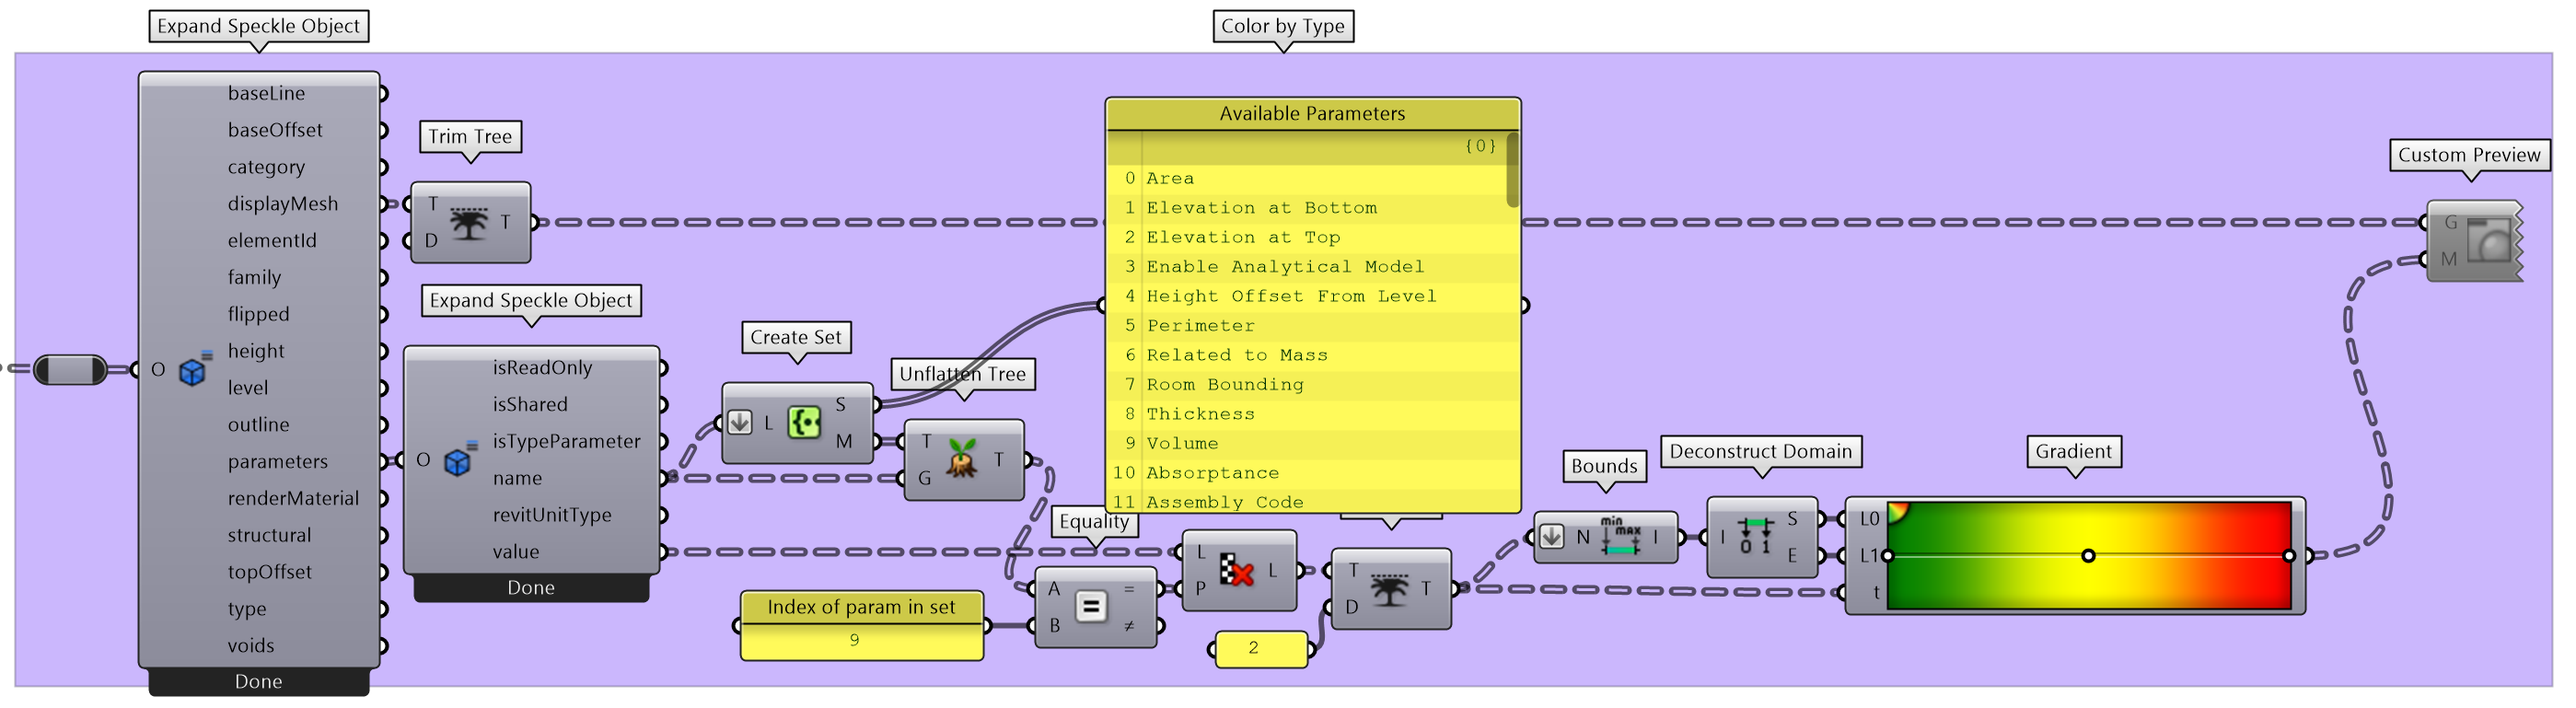 Color elements by parameter